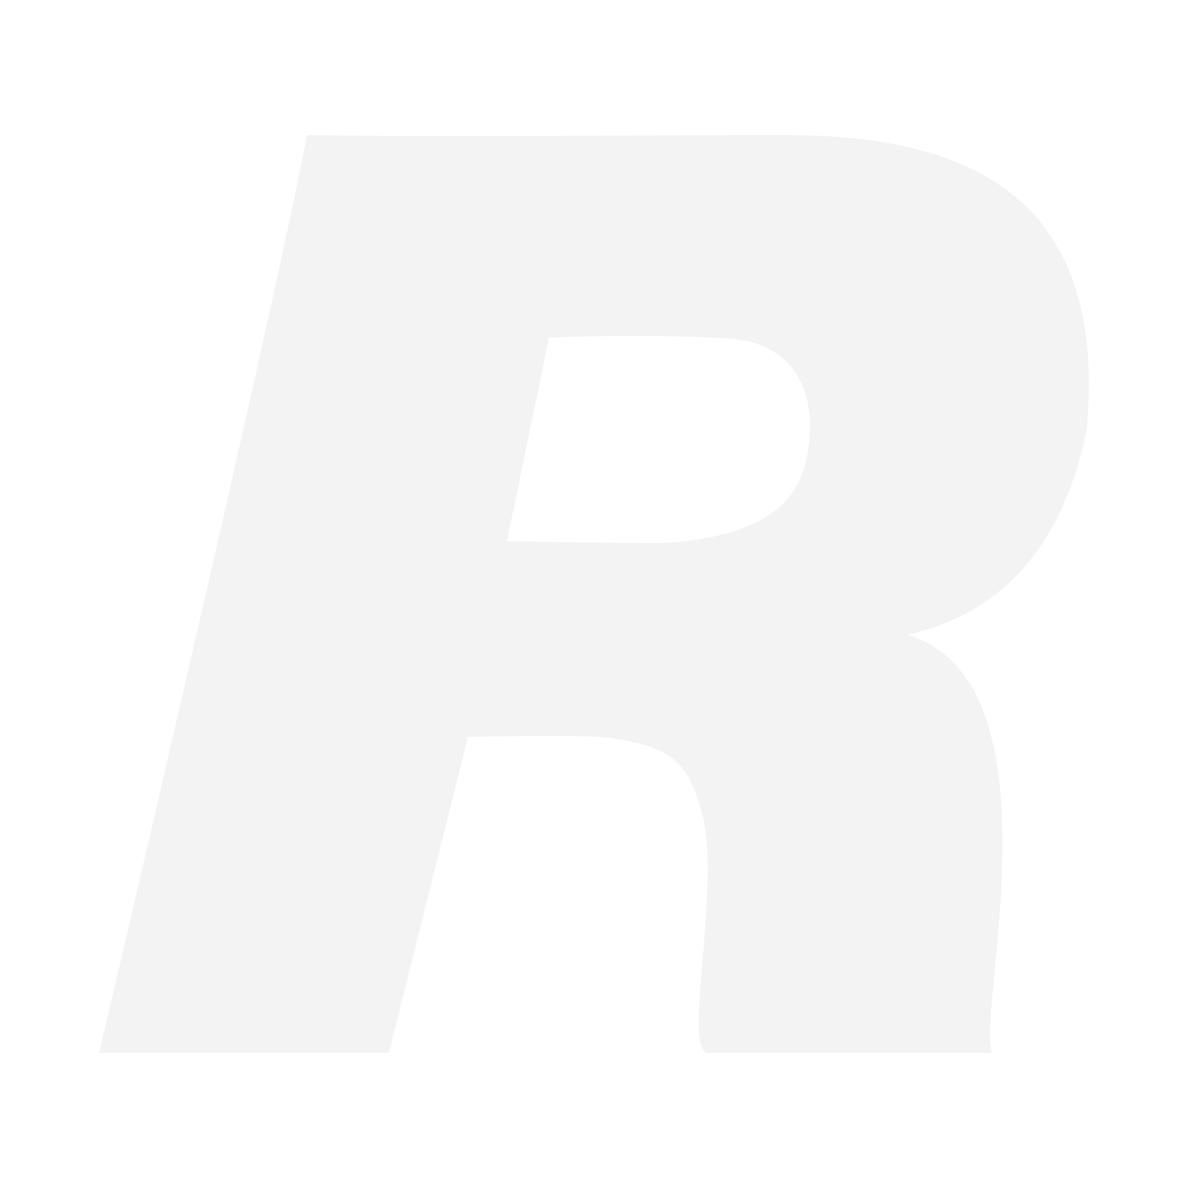 DJI RC Strap Inspire/P3 (Part 44)